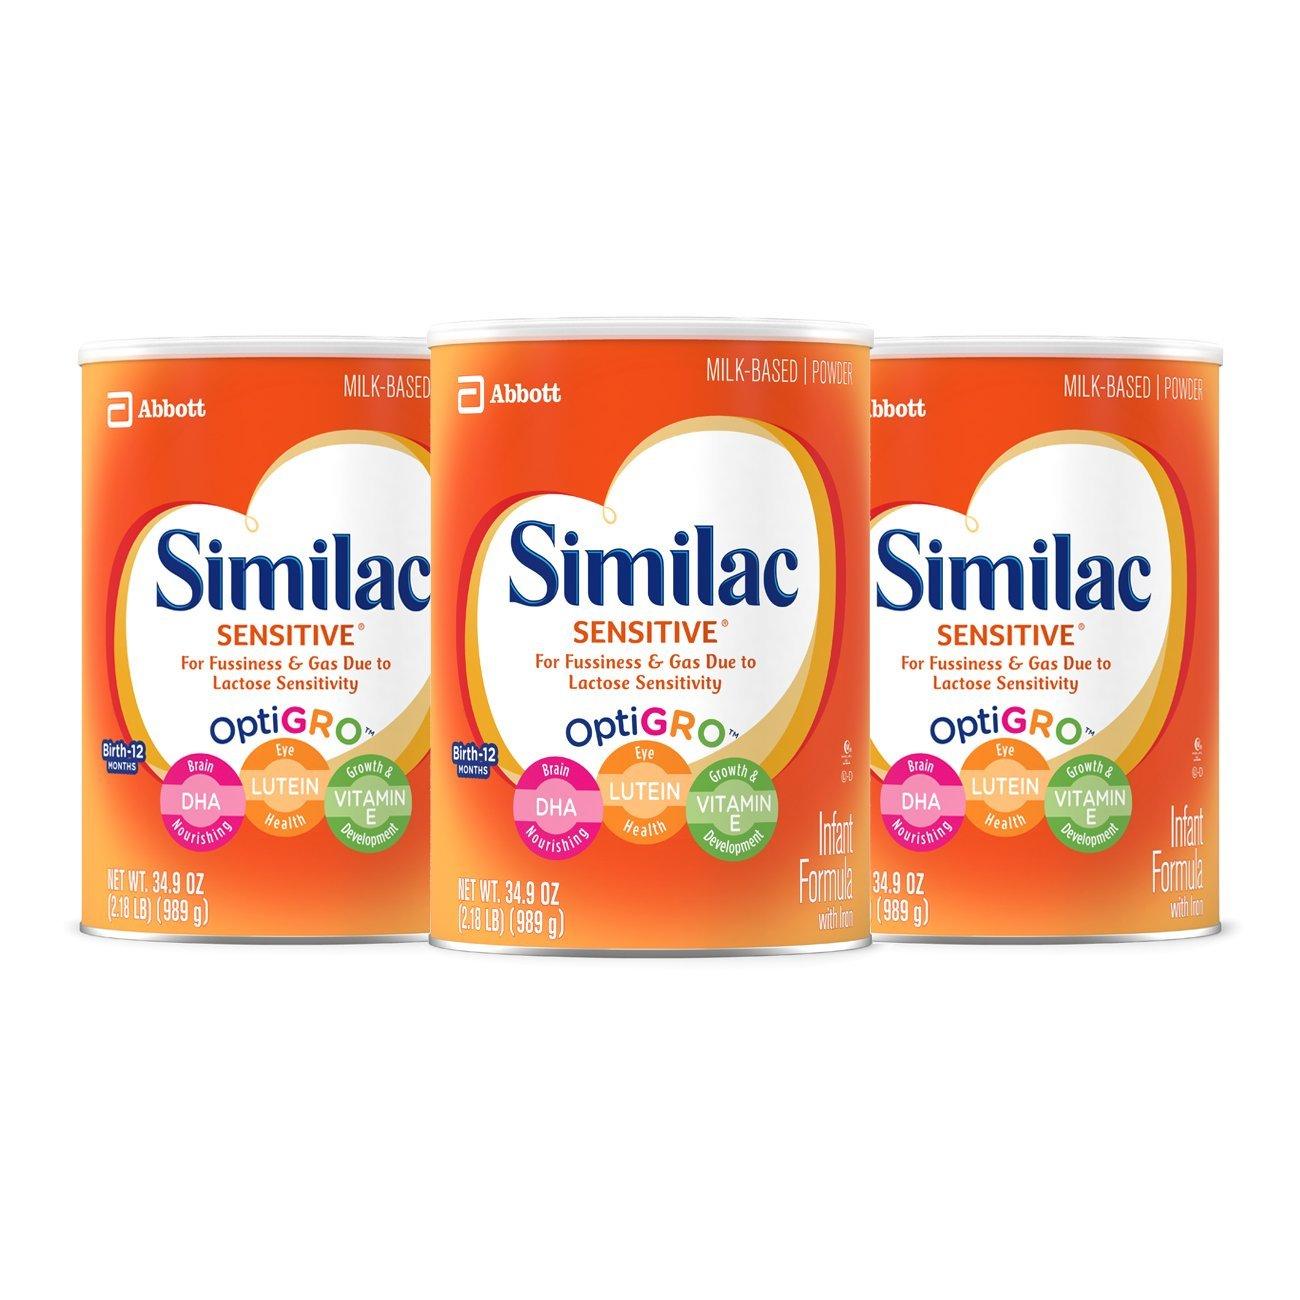 3-Pack Similac Sensitive Infant Milk Formula w/ Iron (34.9oz) - $55.64 + Free S/H